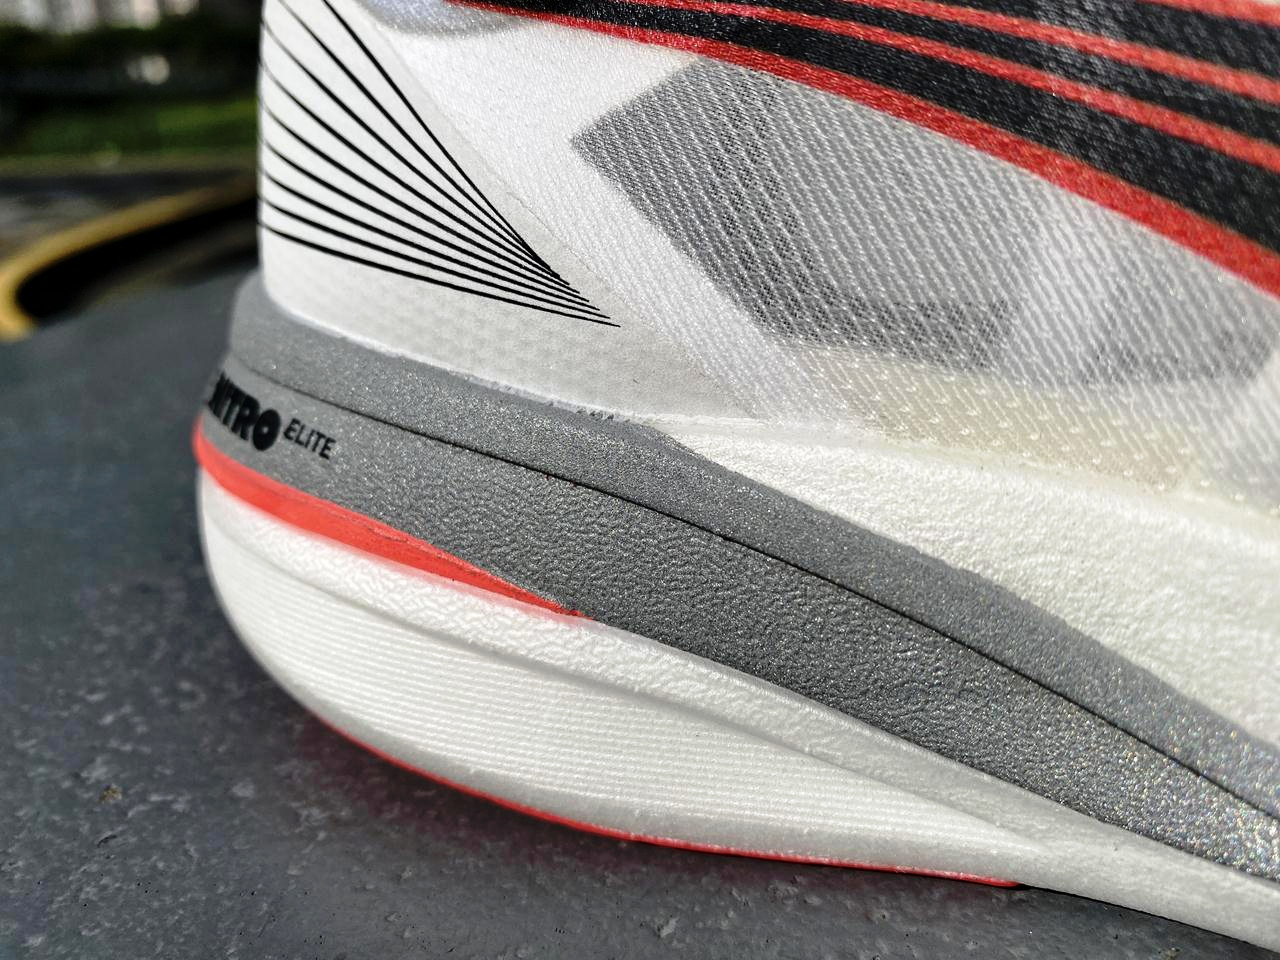 Puma Deviate Nitro Elite - Closeup